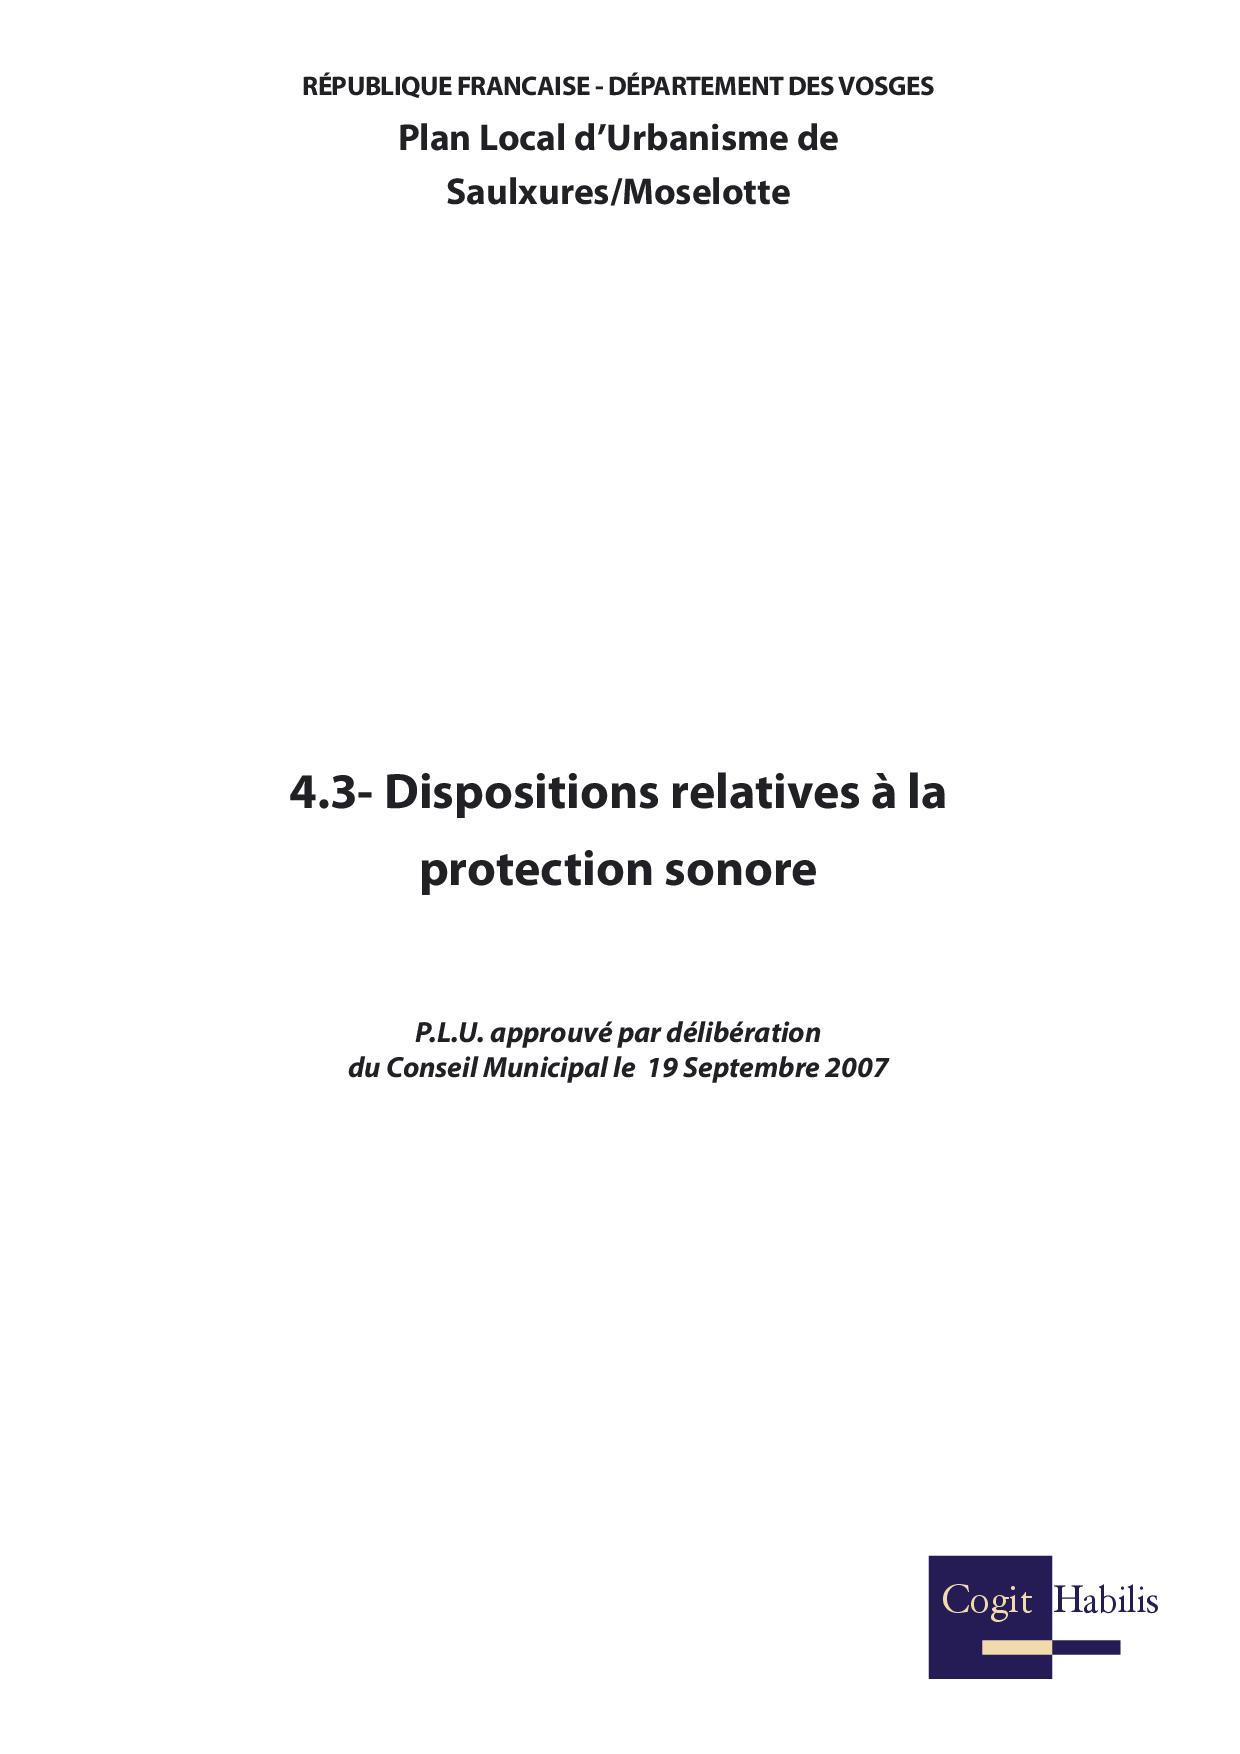 DISPOSITIONS RELATIVE A LA PROTECTION SONORE